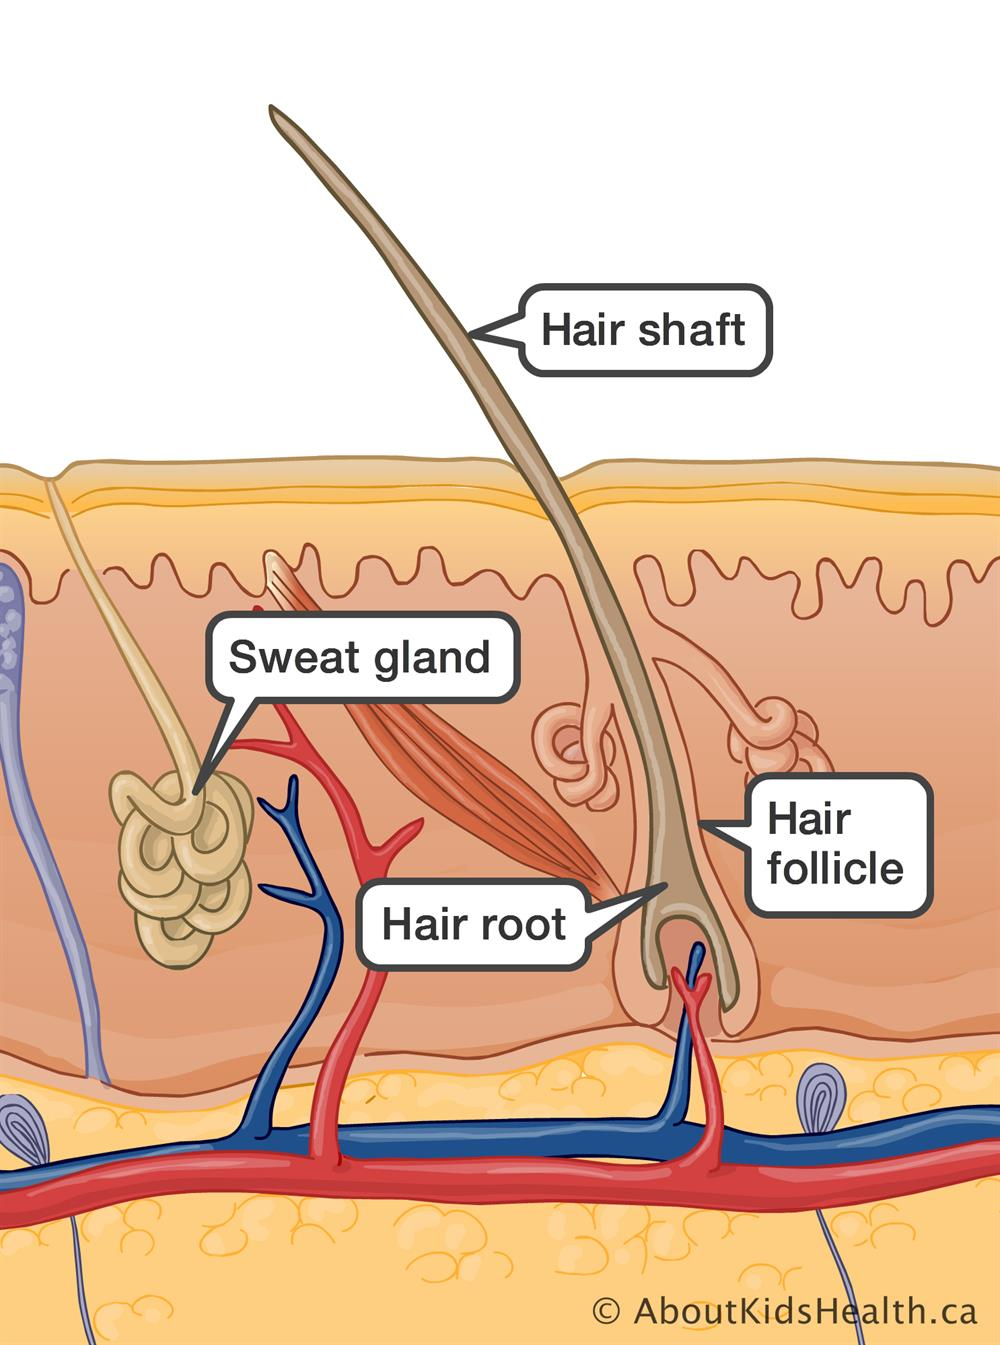 Sweating sickness - Wikipedia